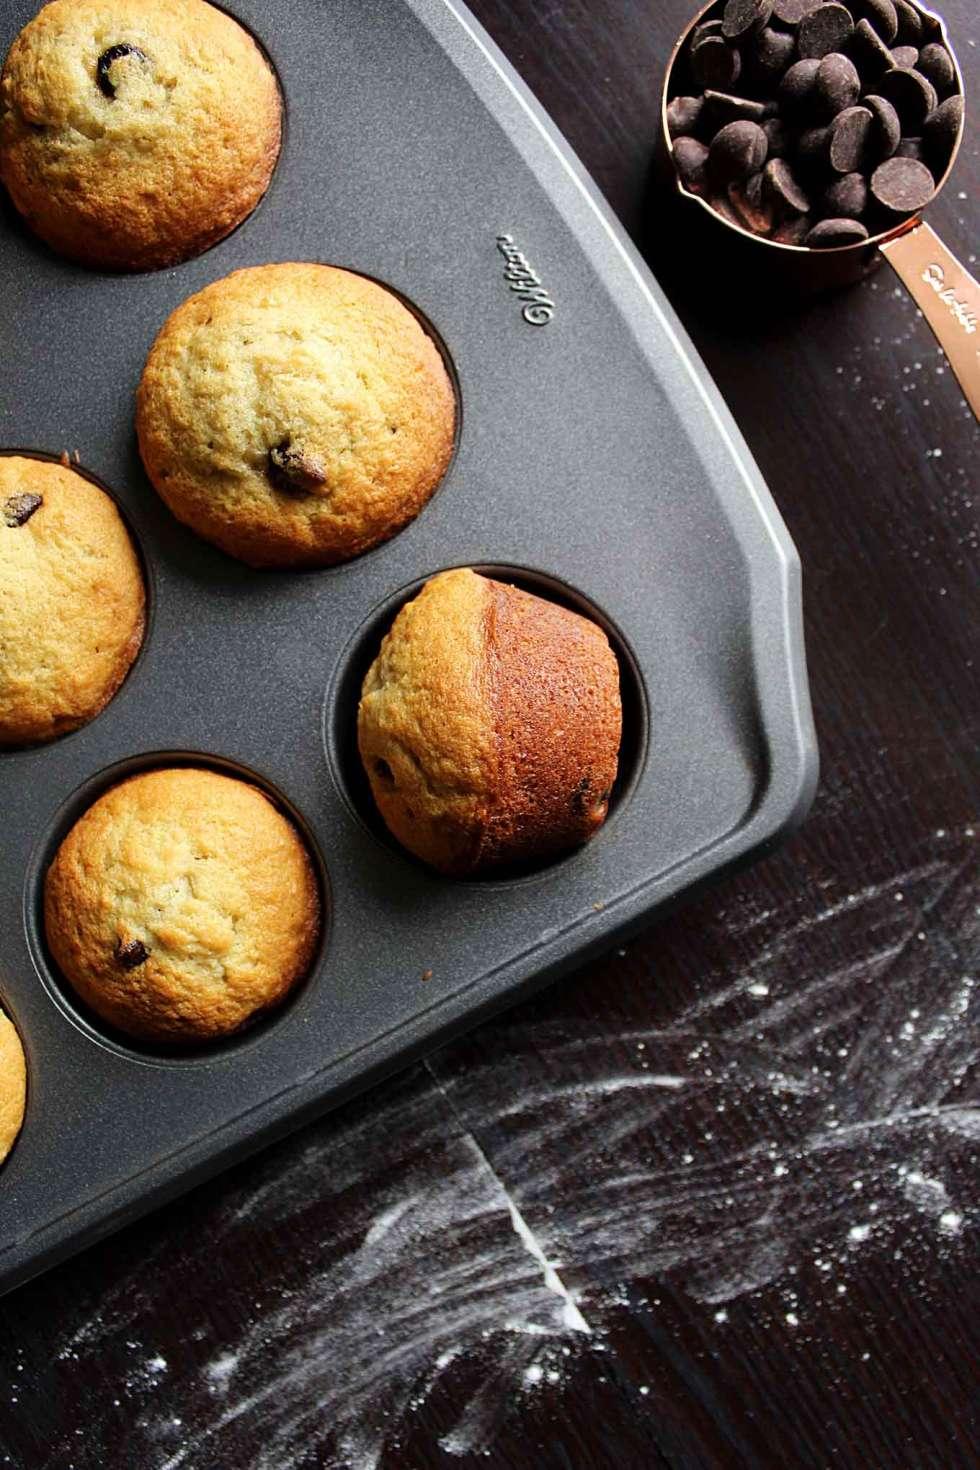 Easy Banana Chocolate Chip Muffins | Recipe | Mini Muffins | Banana Bread | Baked Goods | Breakfast | Brunch | Snacks | Healthy | Vegetarian